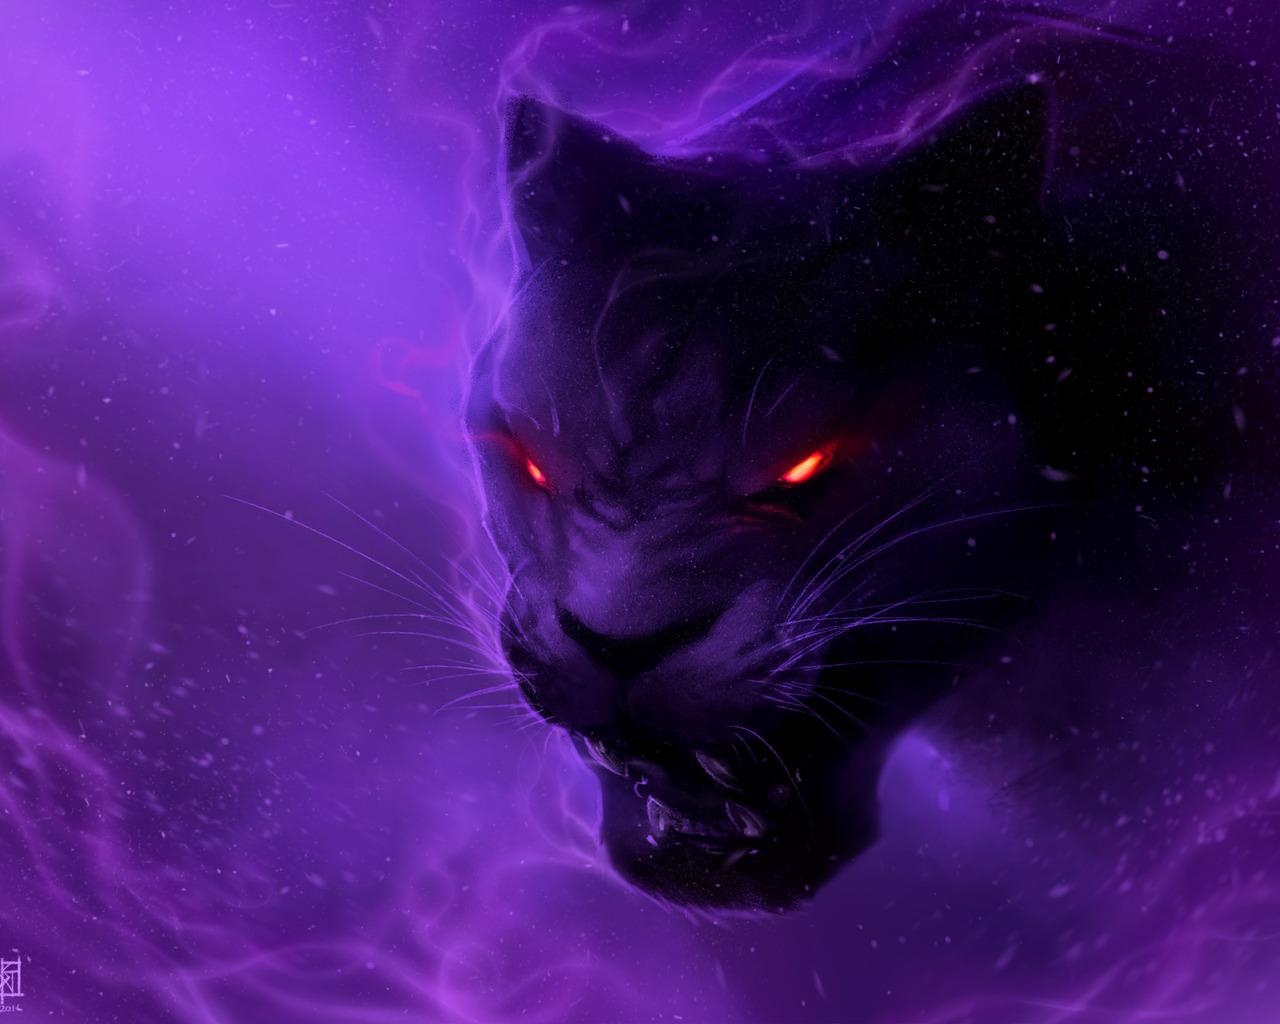 1280x1024 Black Panther Digital Art Illustration 1280x1024